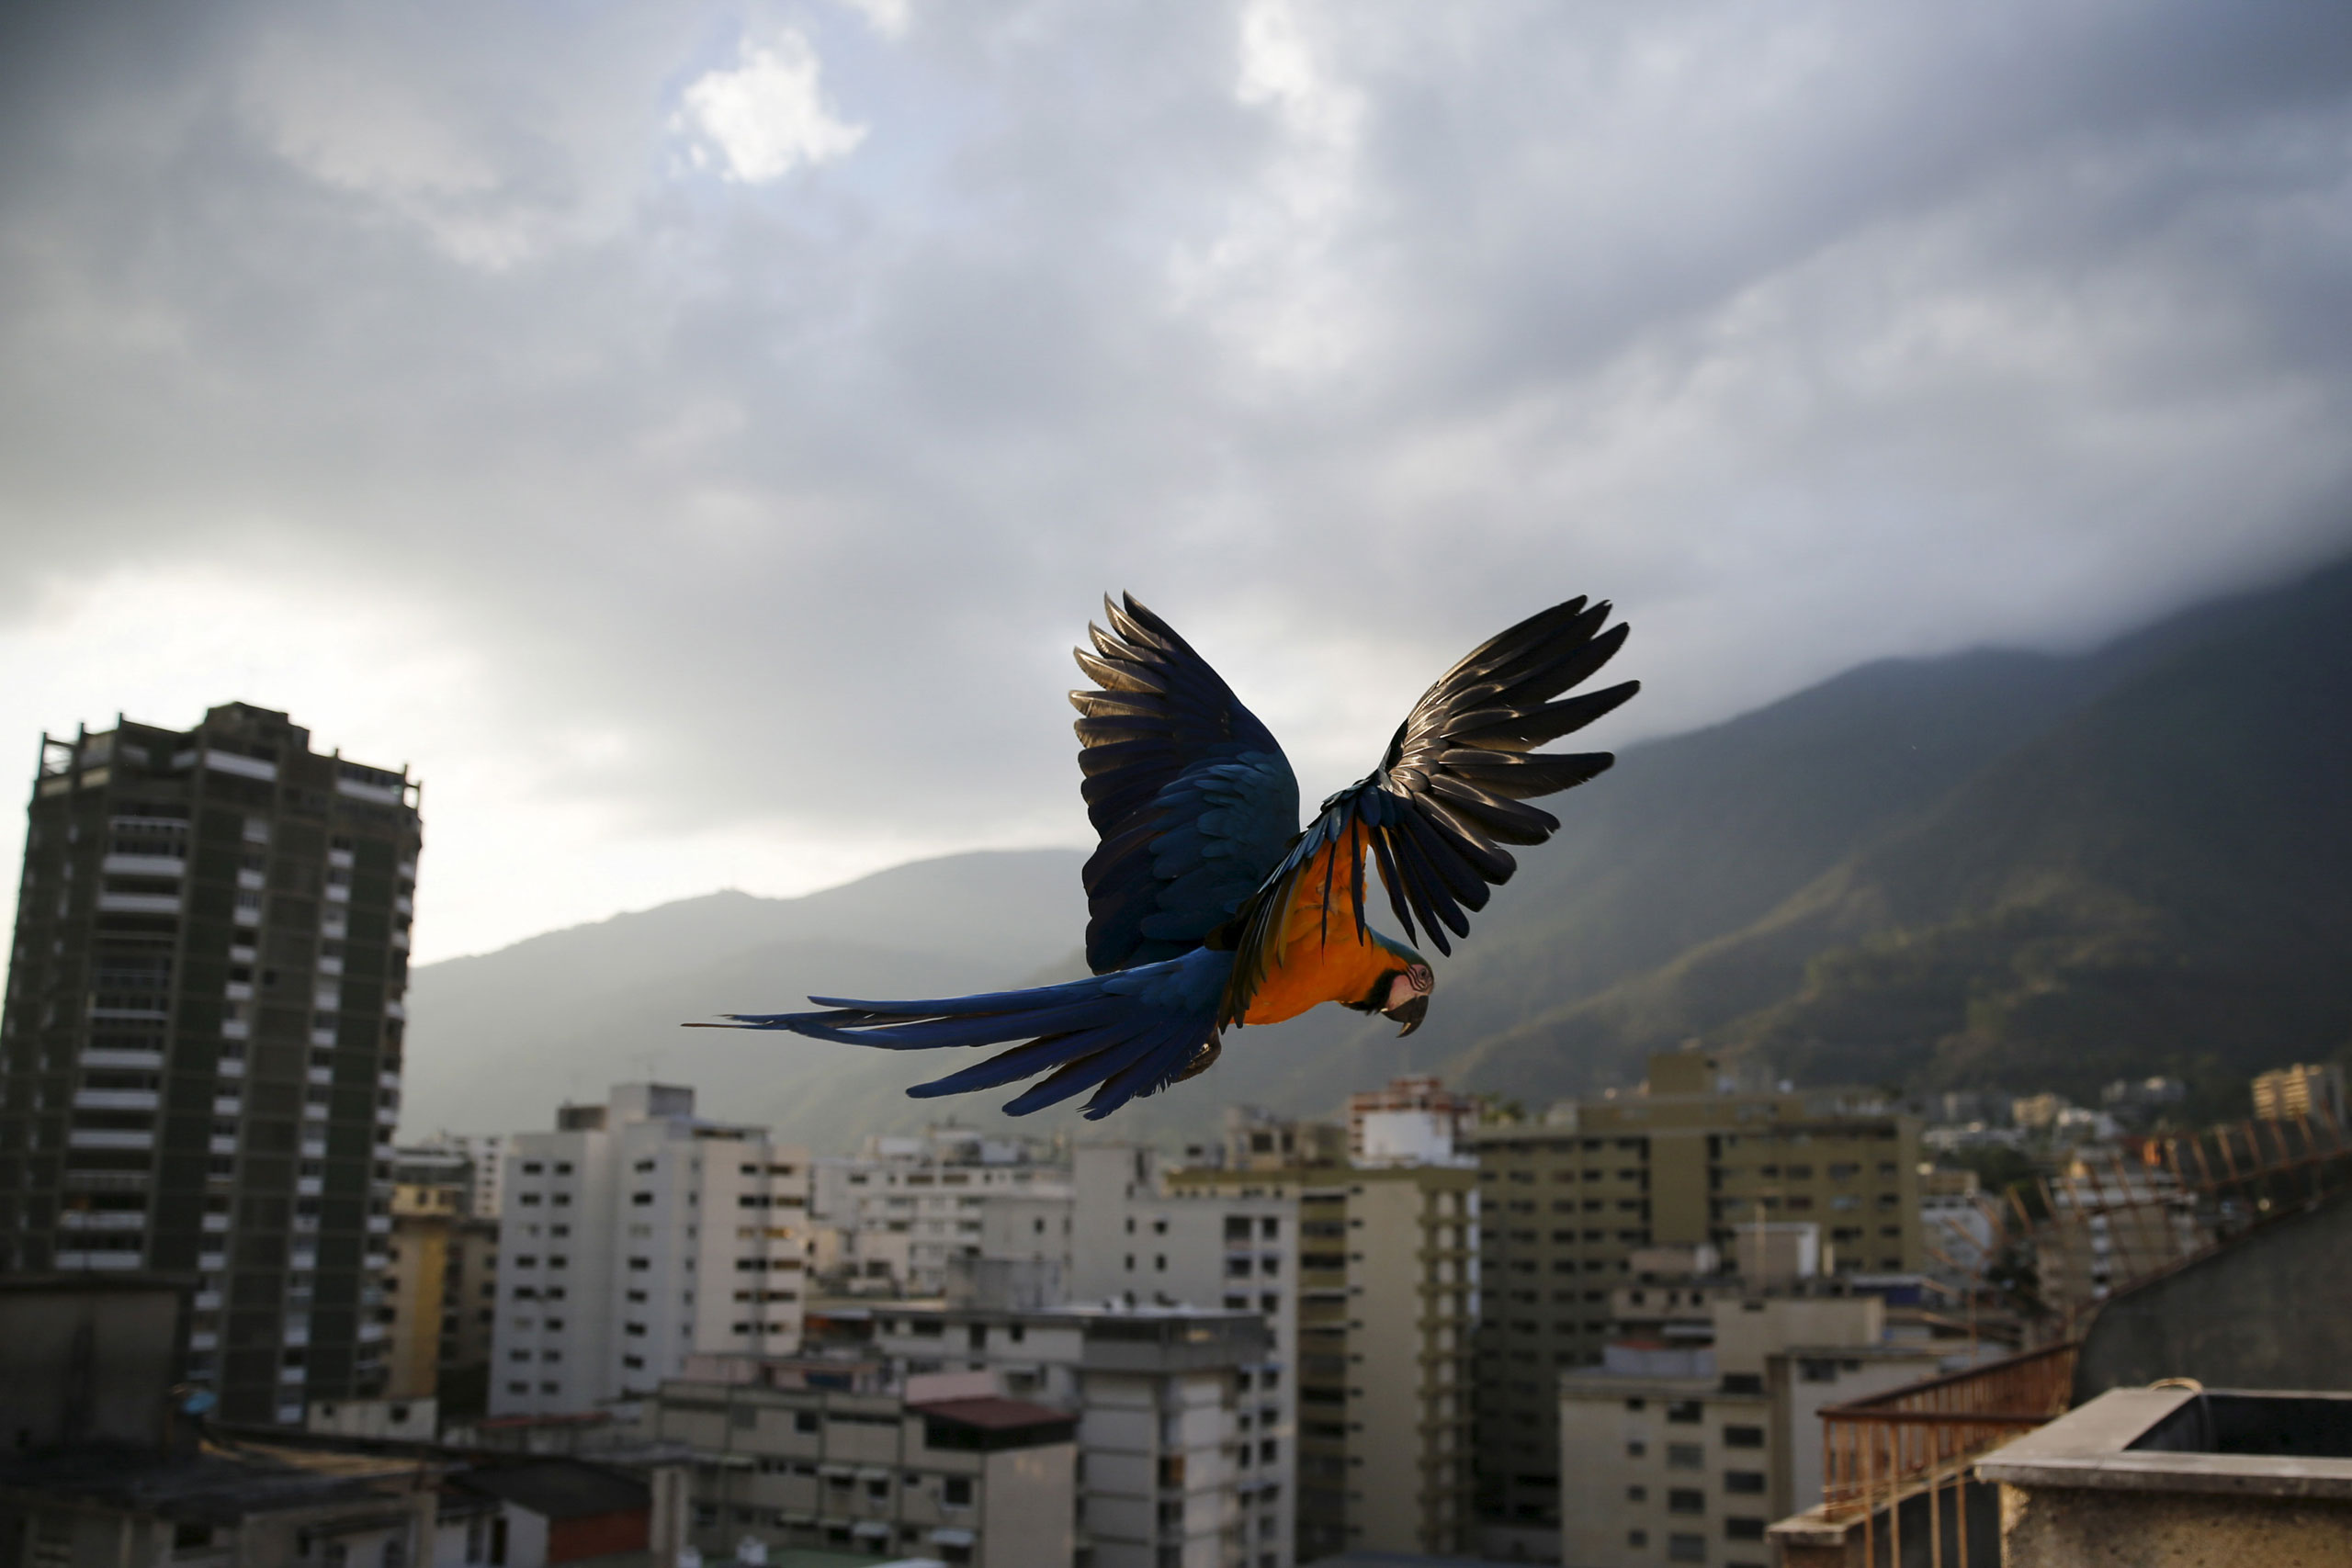 A macaw flies over buildings with the Avila mountain behind, Caracas, Venezuela, March 31, 2015.